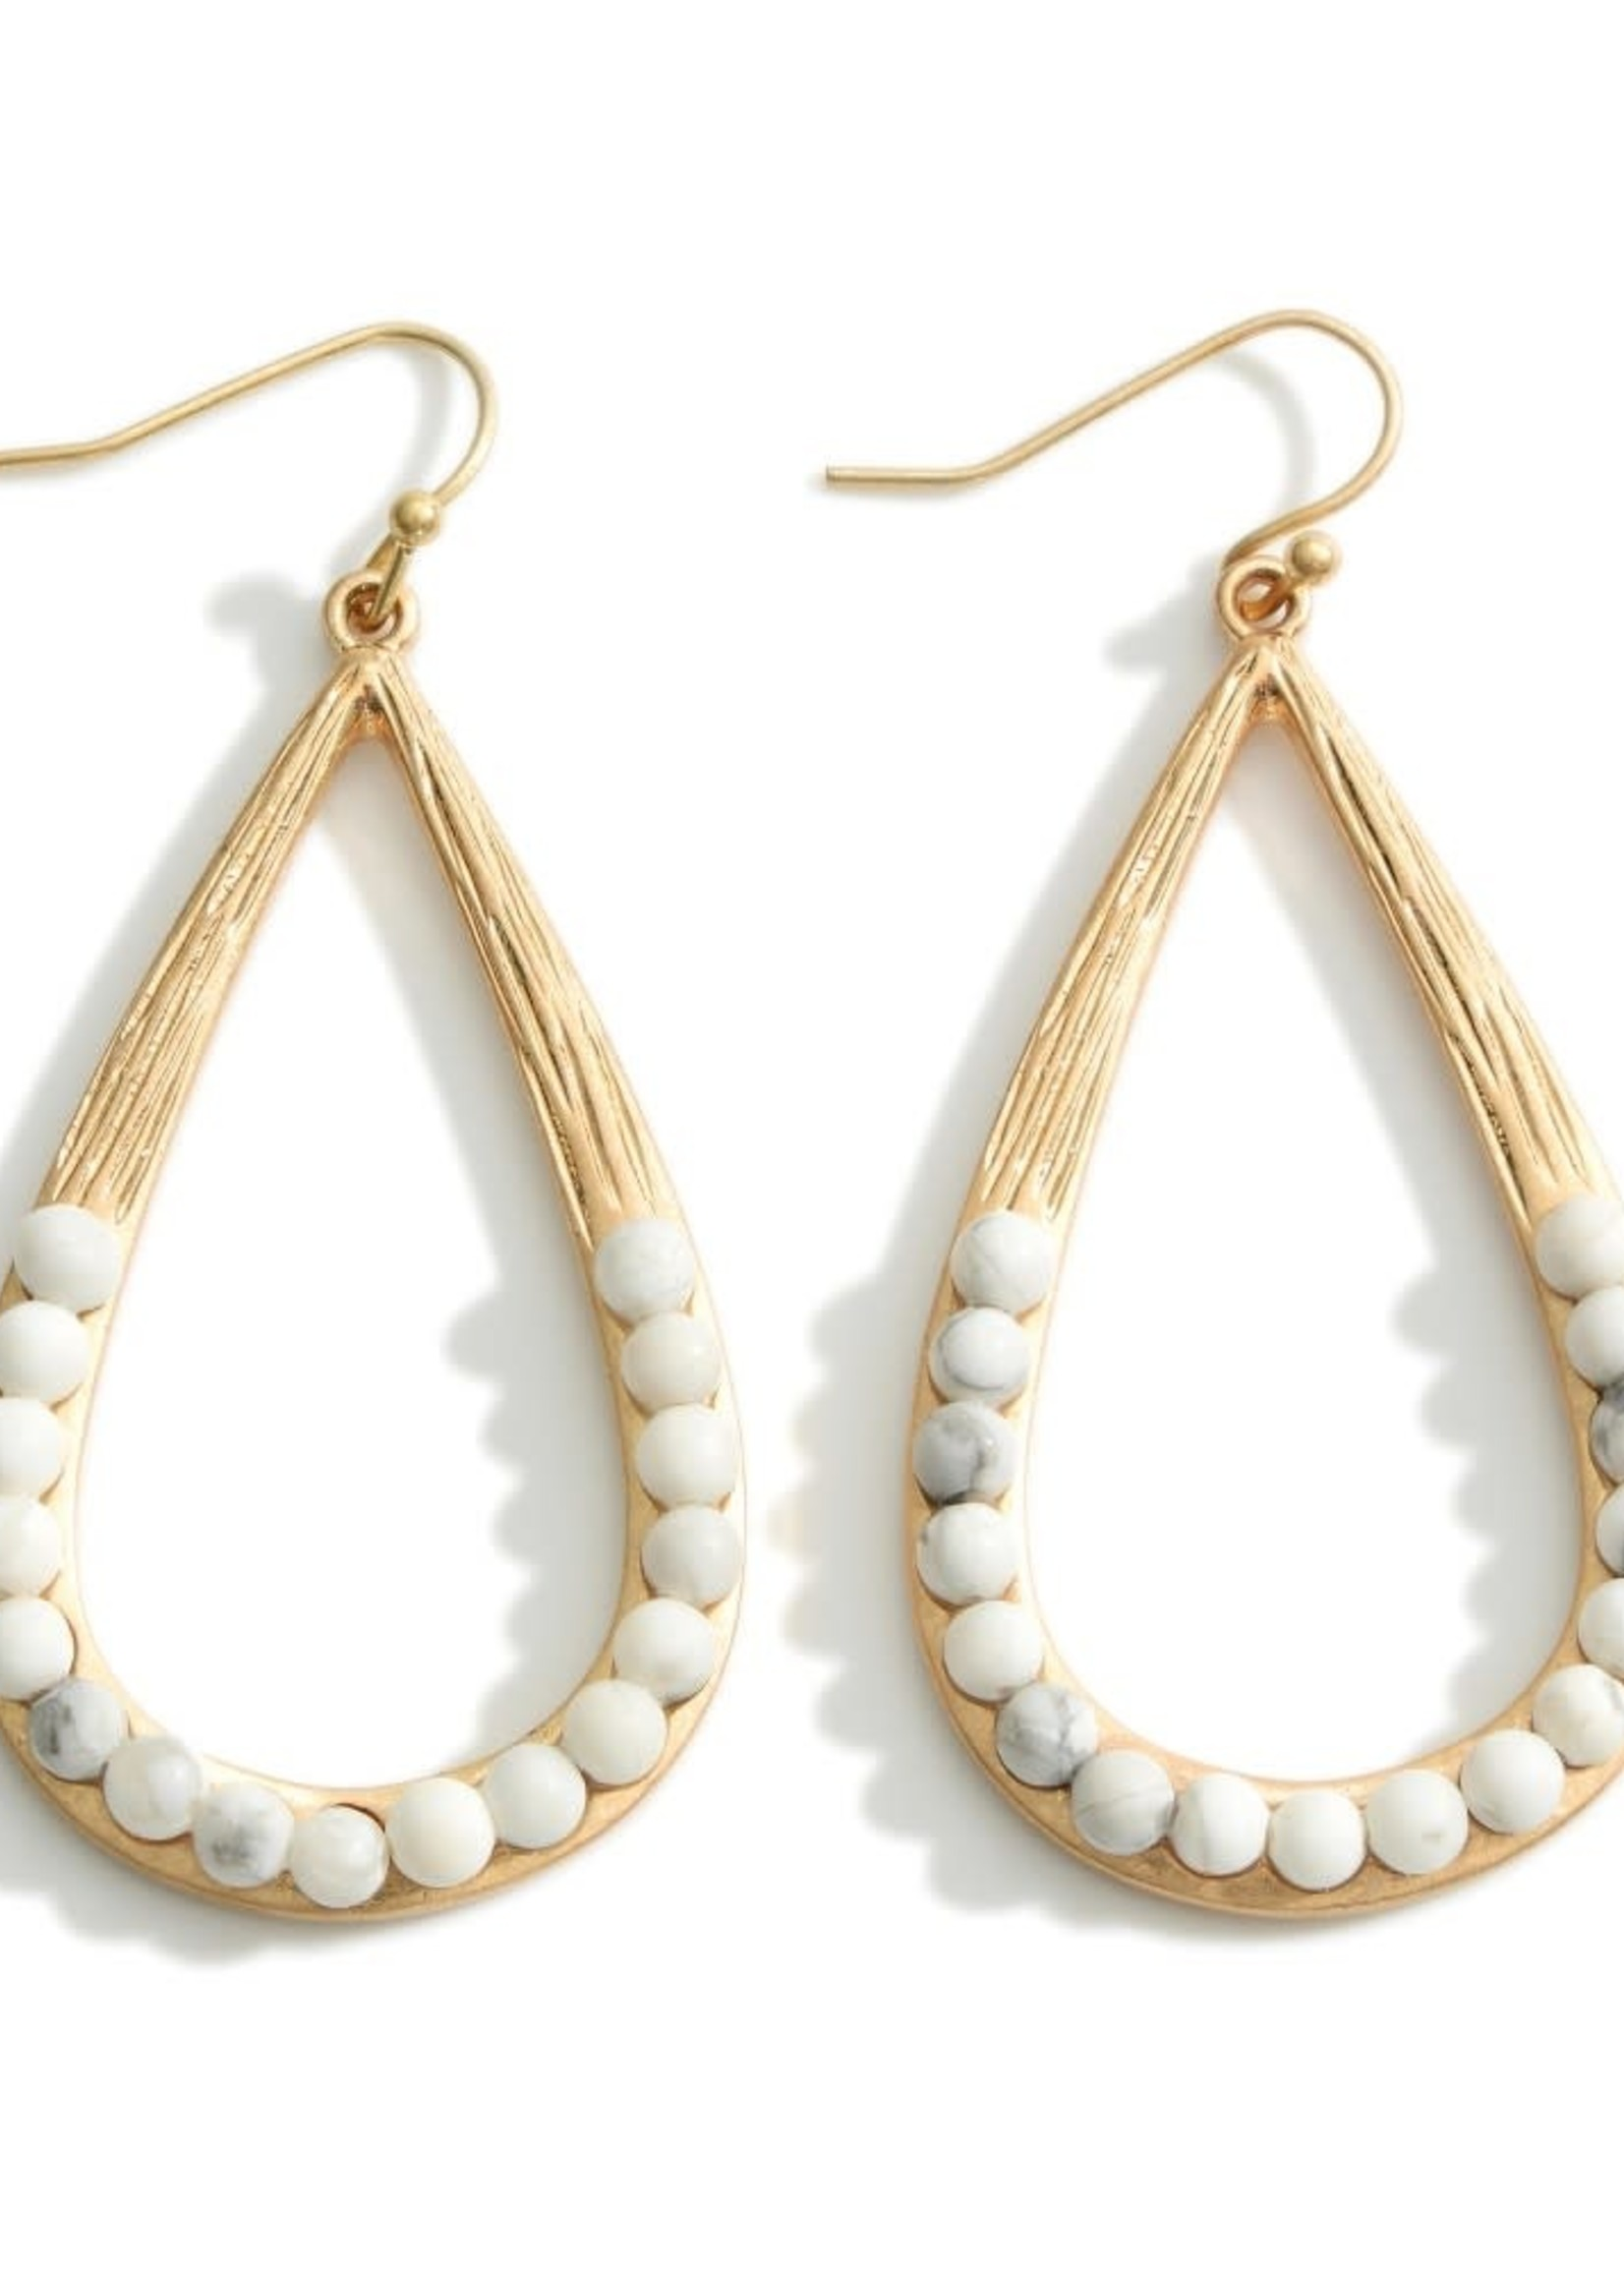 White Howlite Metal Teardrop Earrings